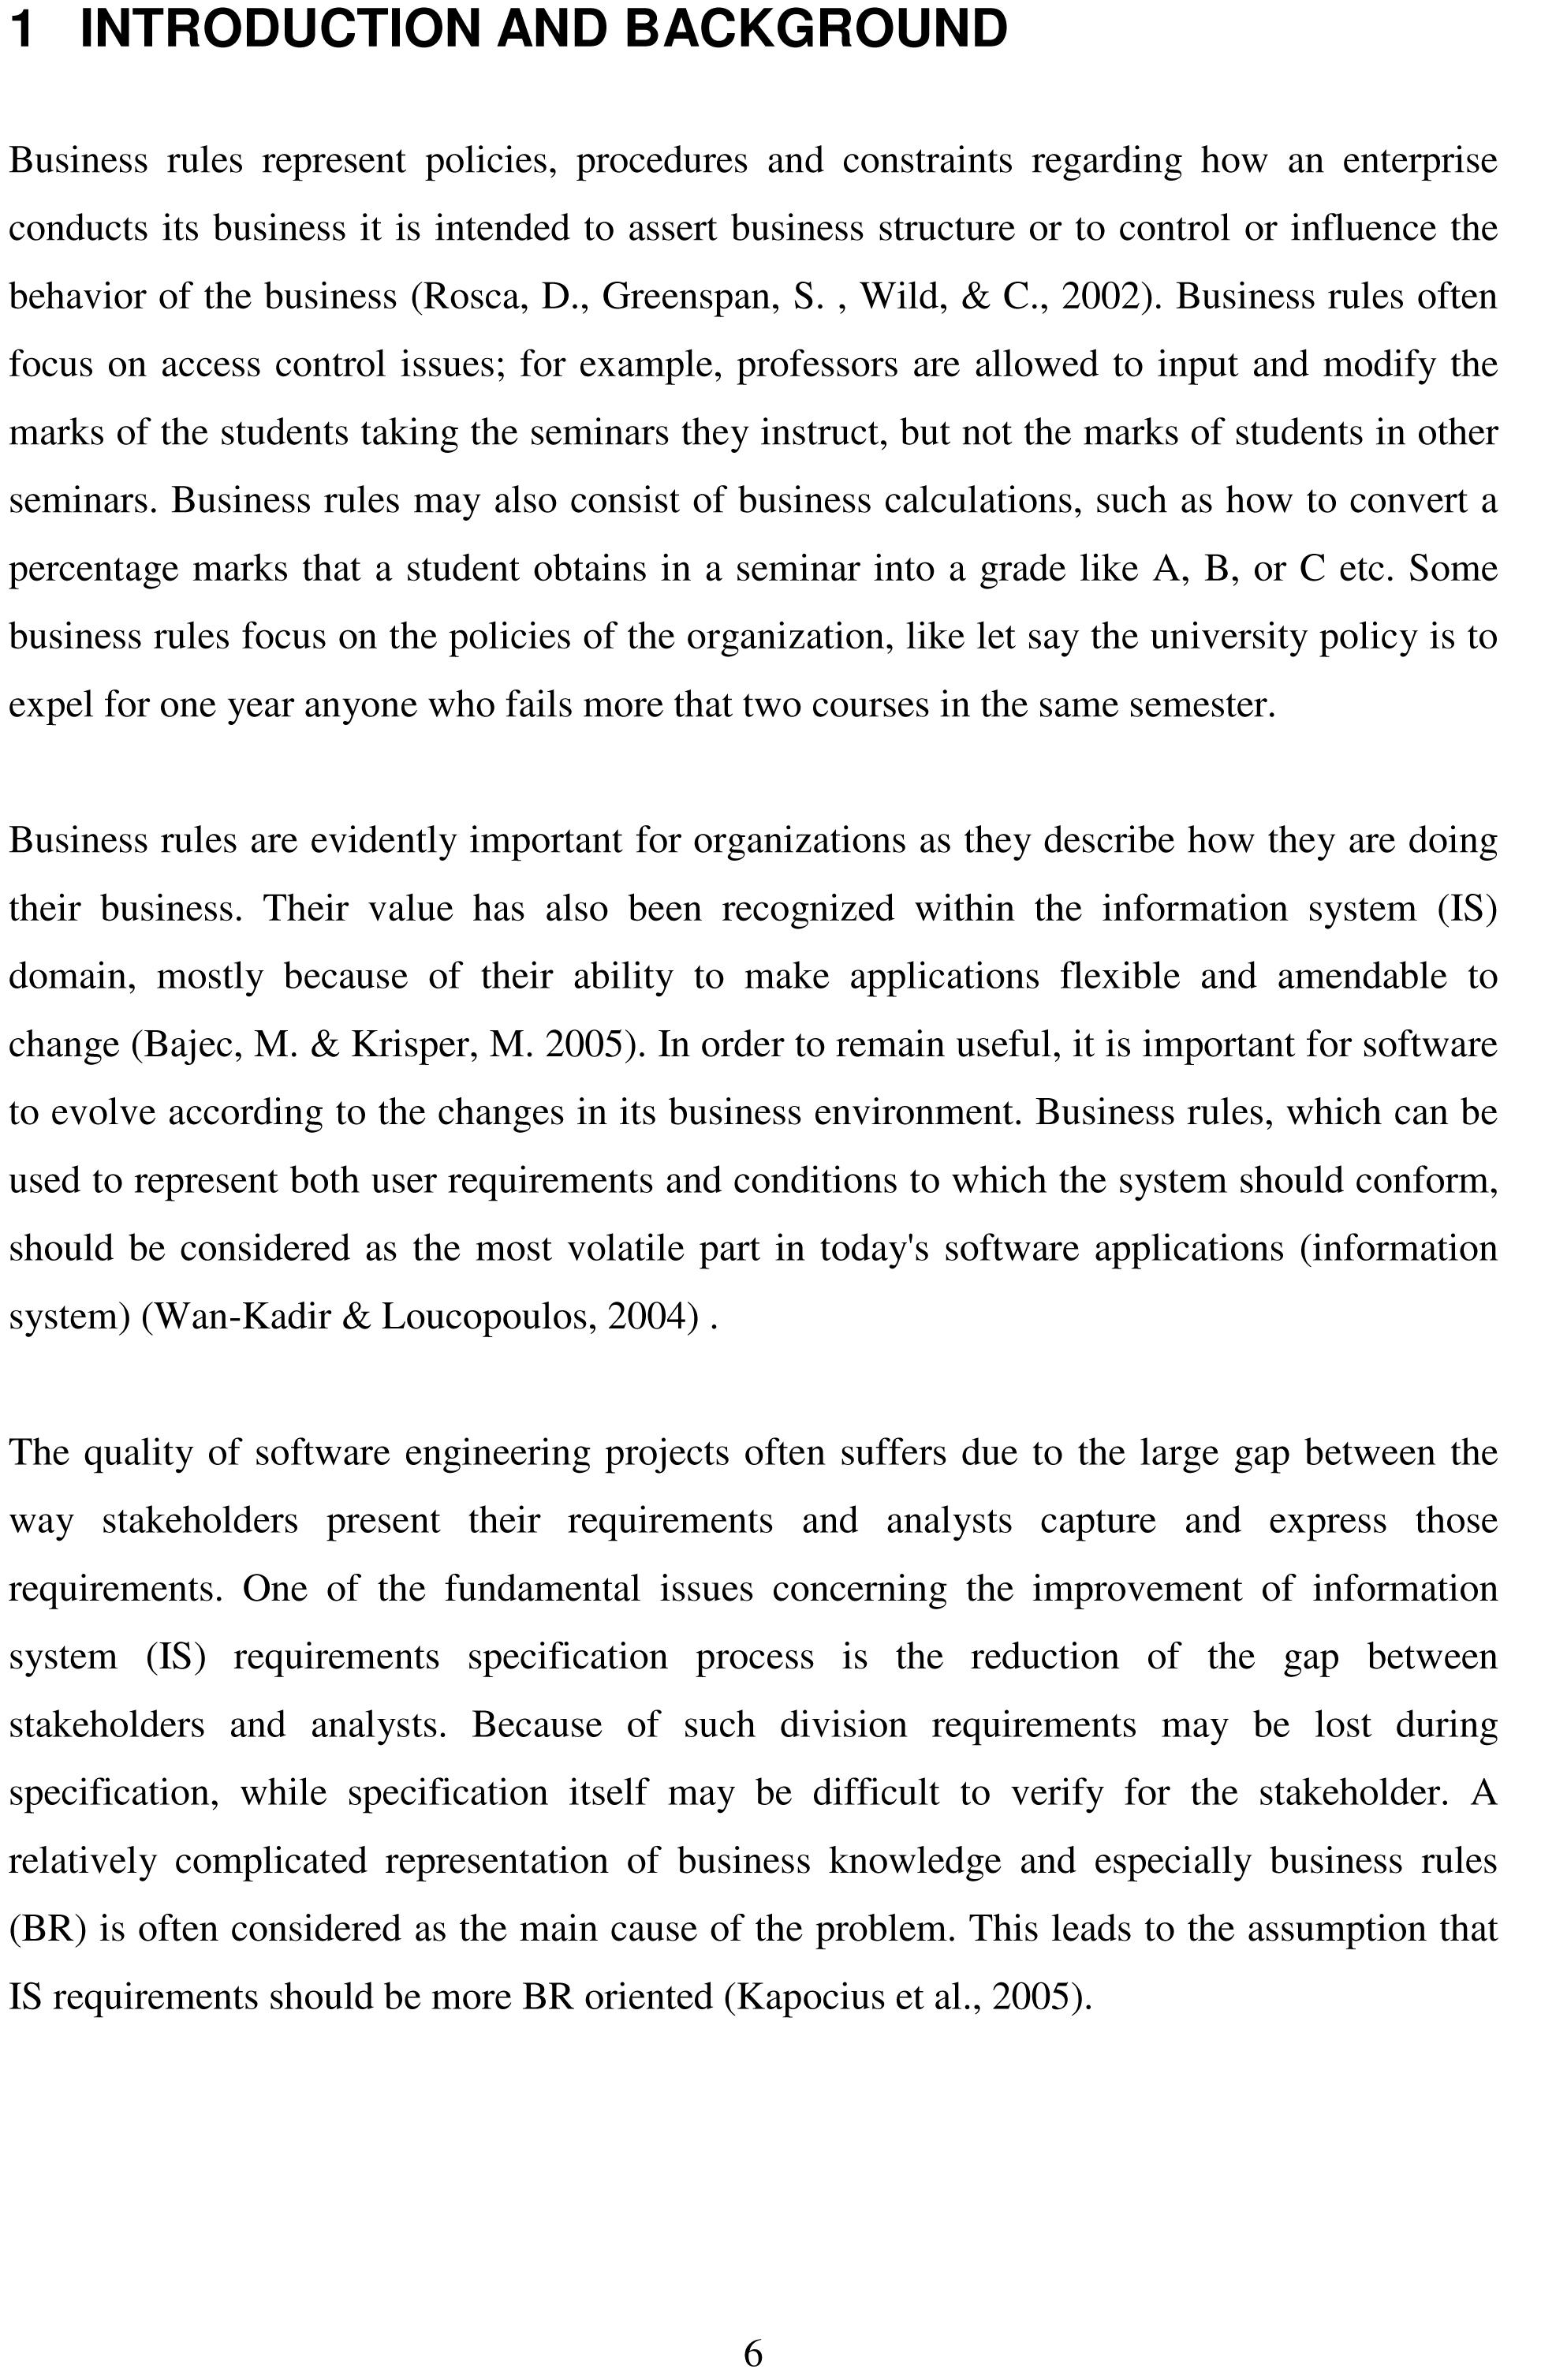 025 Essay Example Free Essays Thesis Singular 123 Easy Full